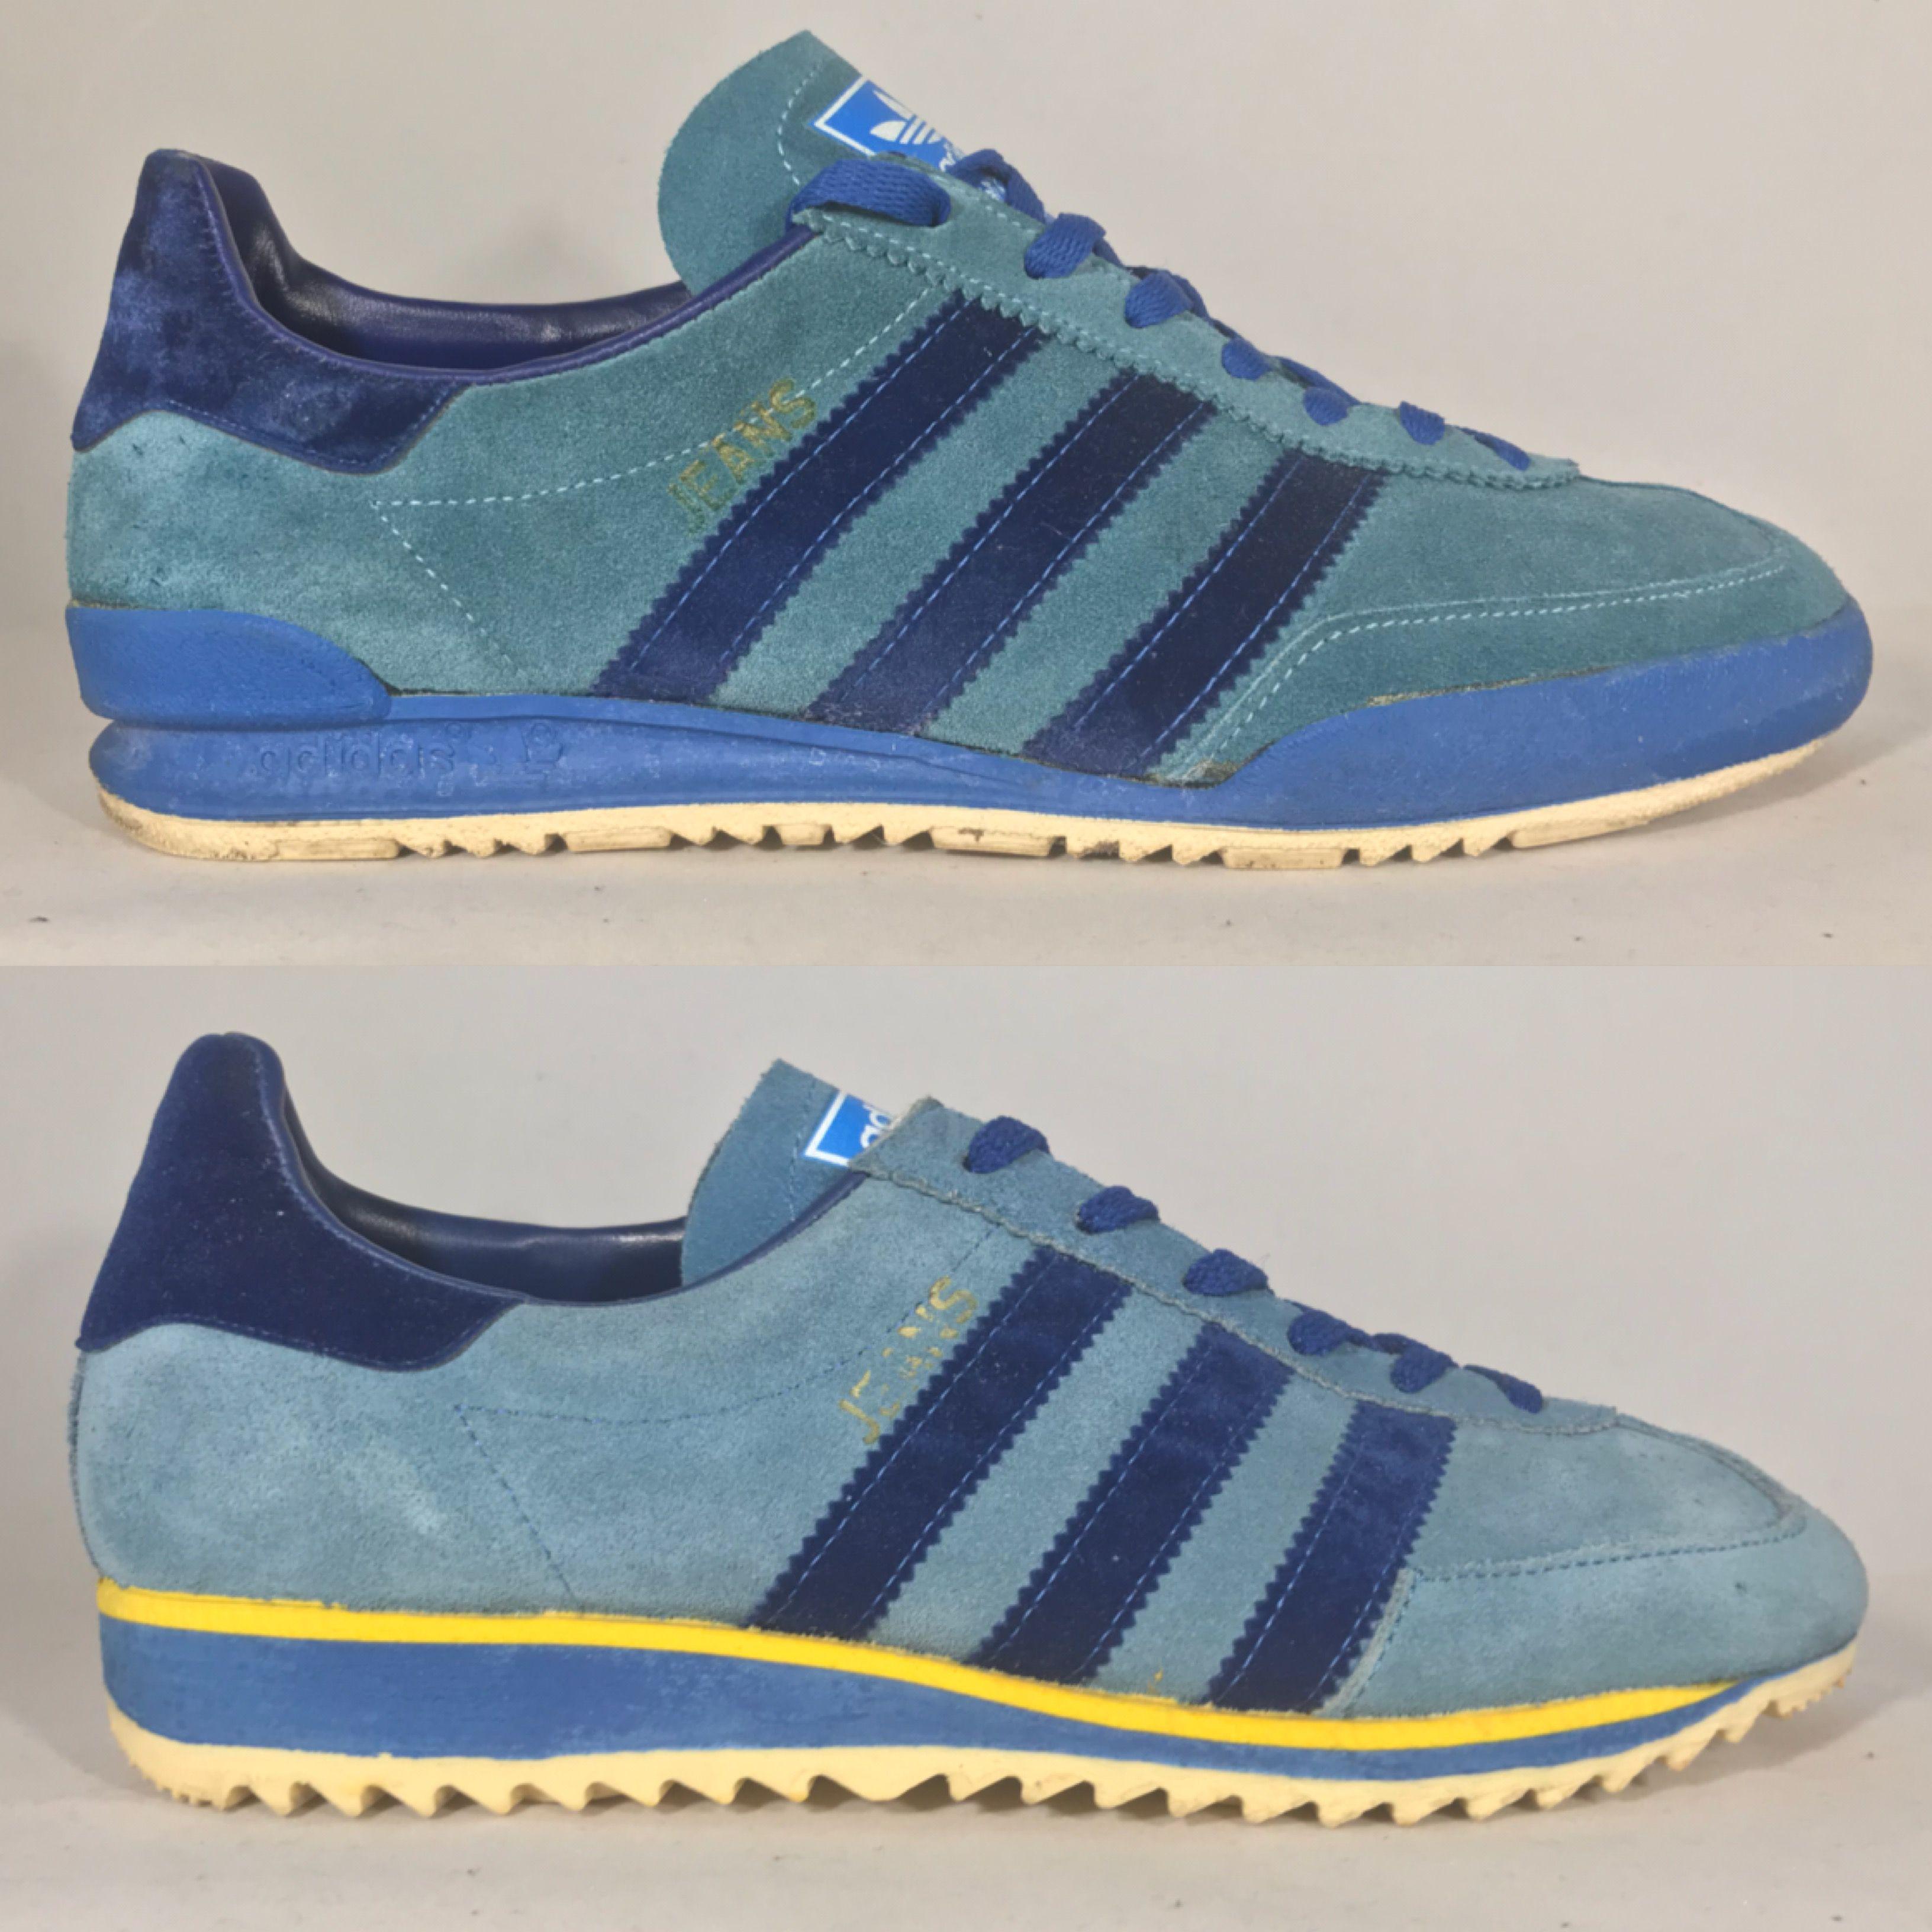 Austrian made Adidas Jeans MKI (top) & MKII | Vintage